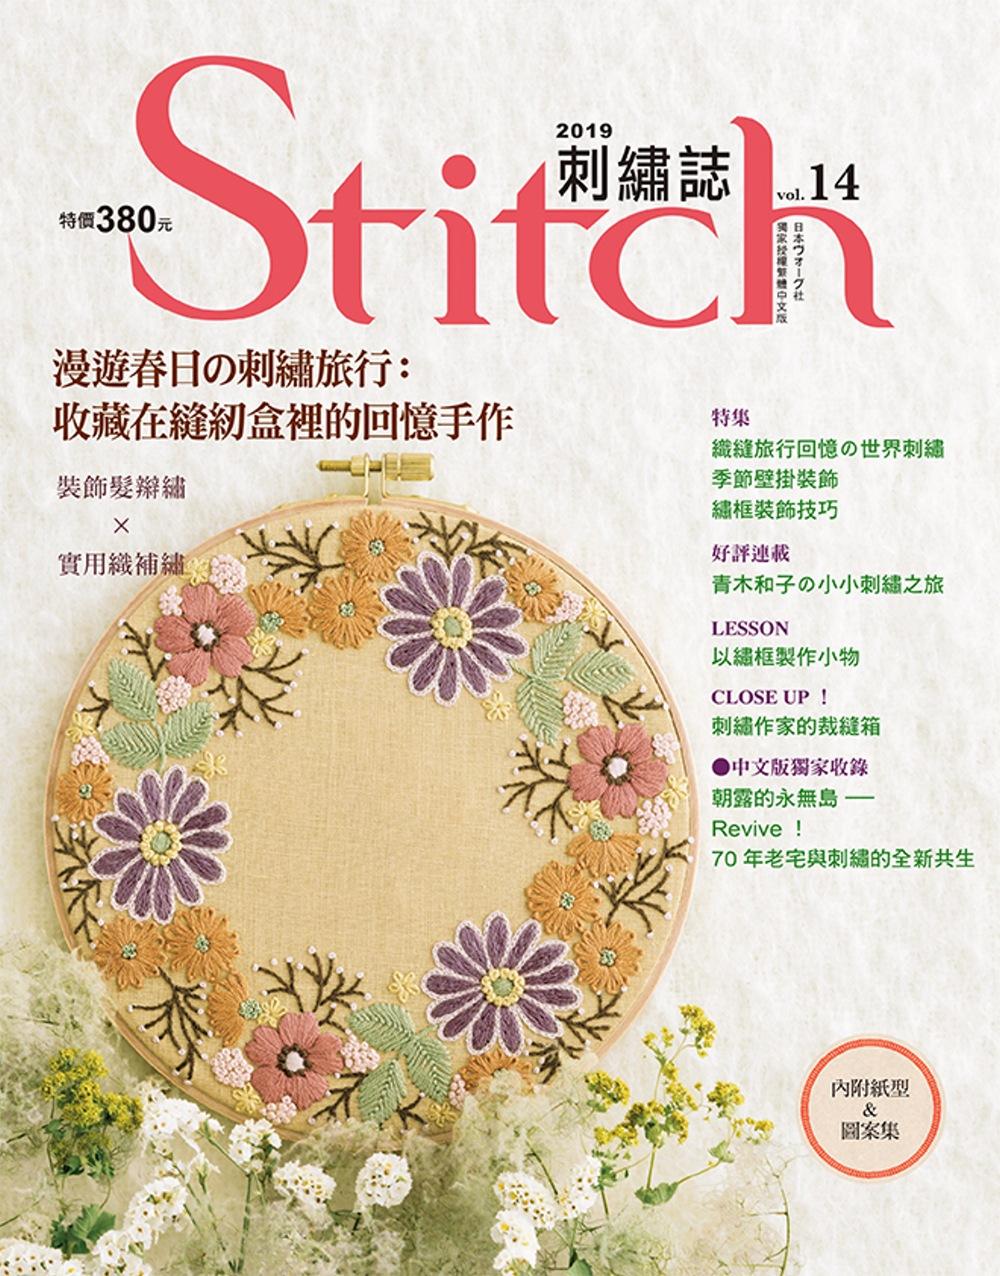 Stitch刺繡誌14:漫遊春日の刺繡旅行:收藏在縫紉盒裡的回憶手作:裝飾髮辮繡×實用織補繡